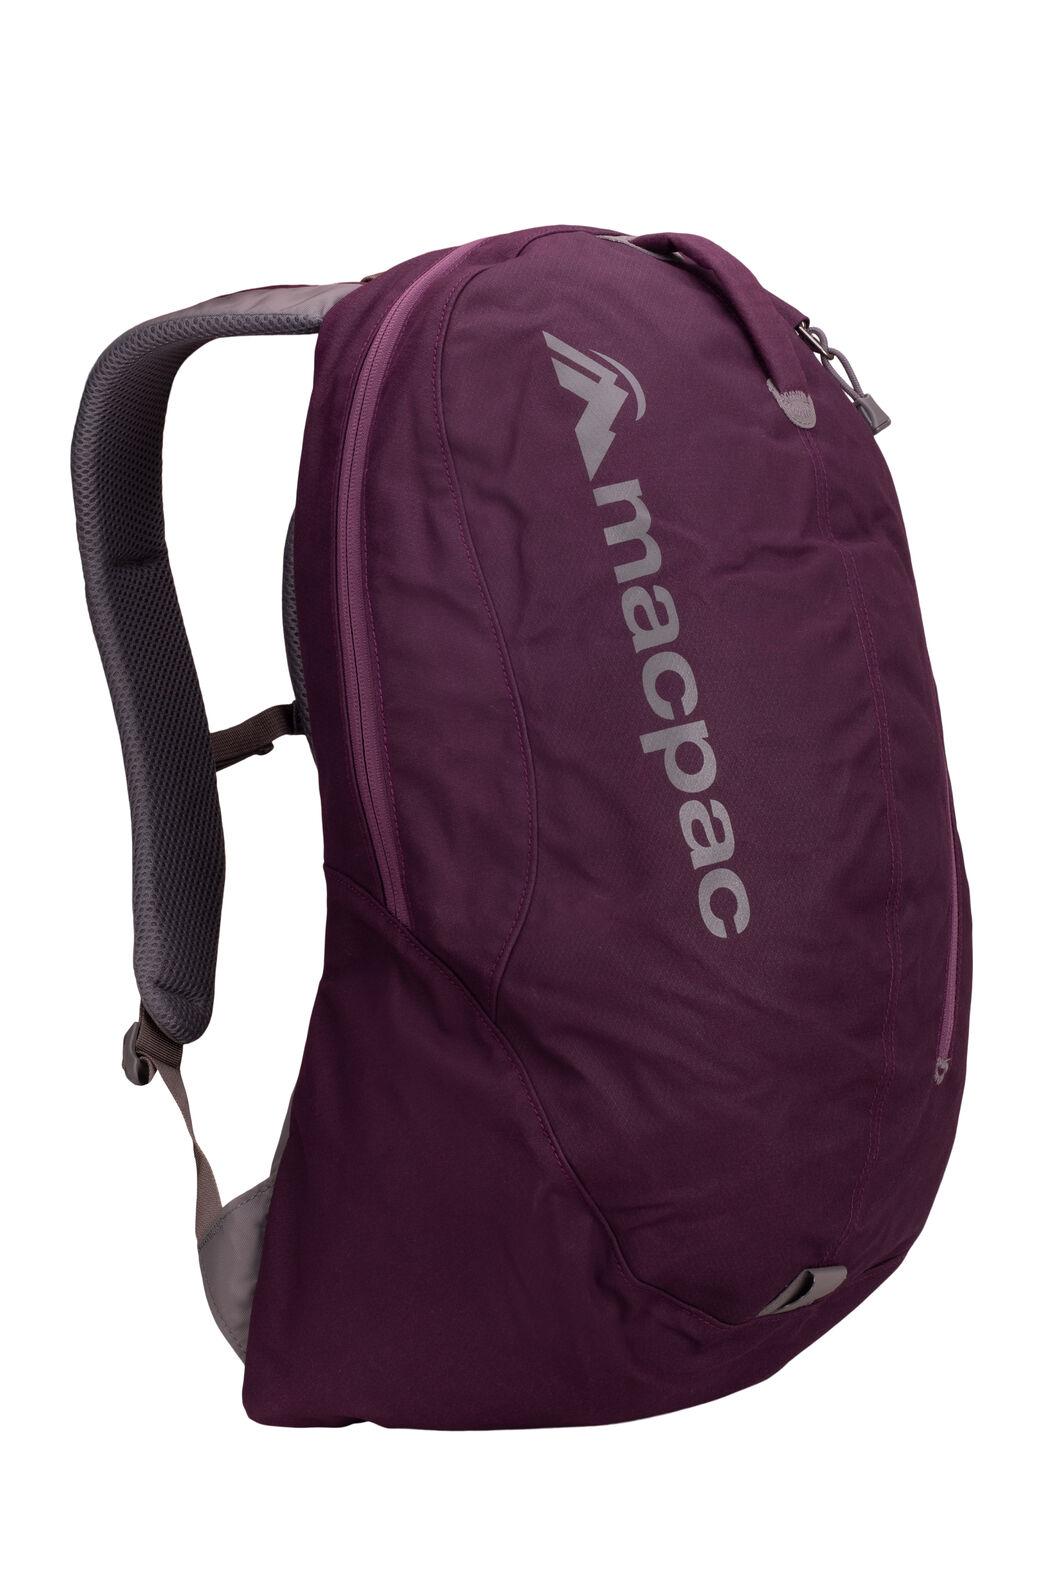 Macpac Kahu 22L AzTec® Backpack, Potent Purple/Grey, hi-res